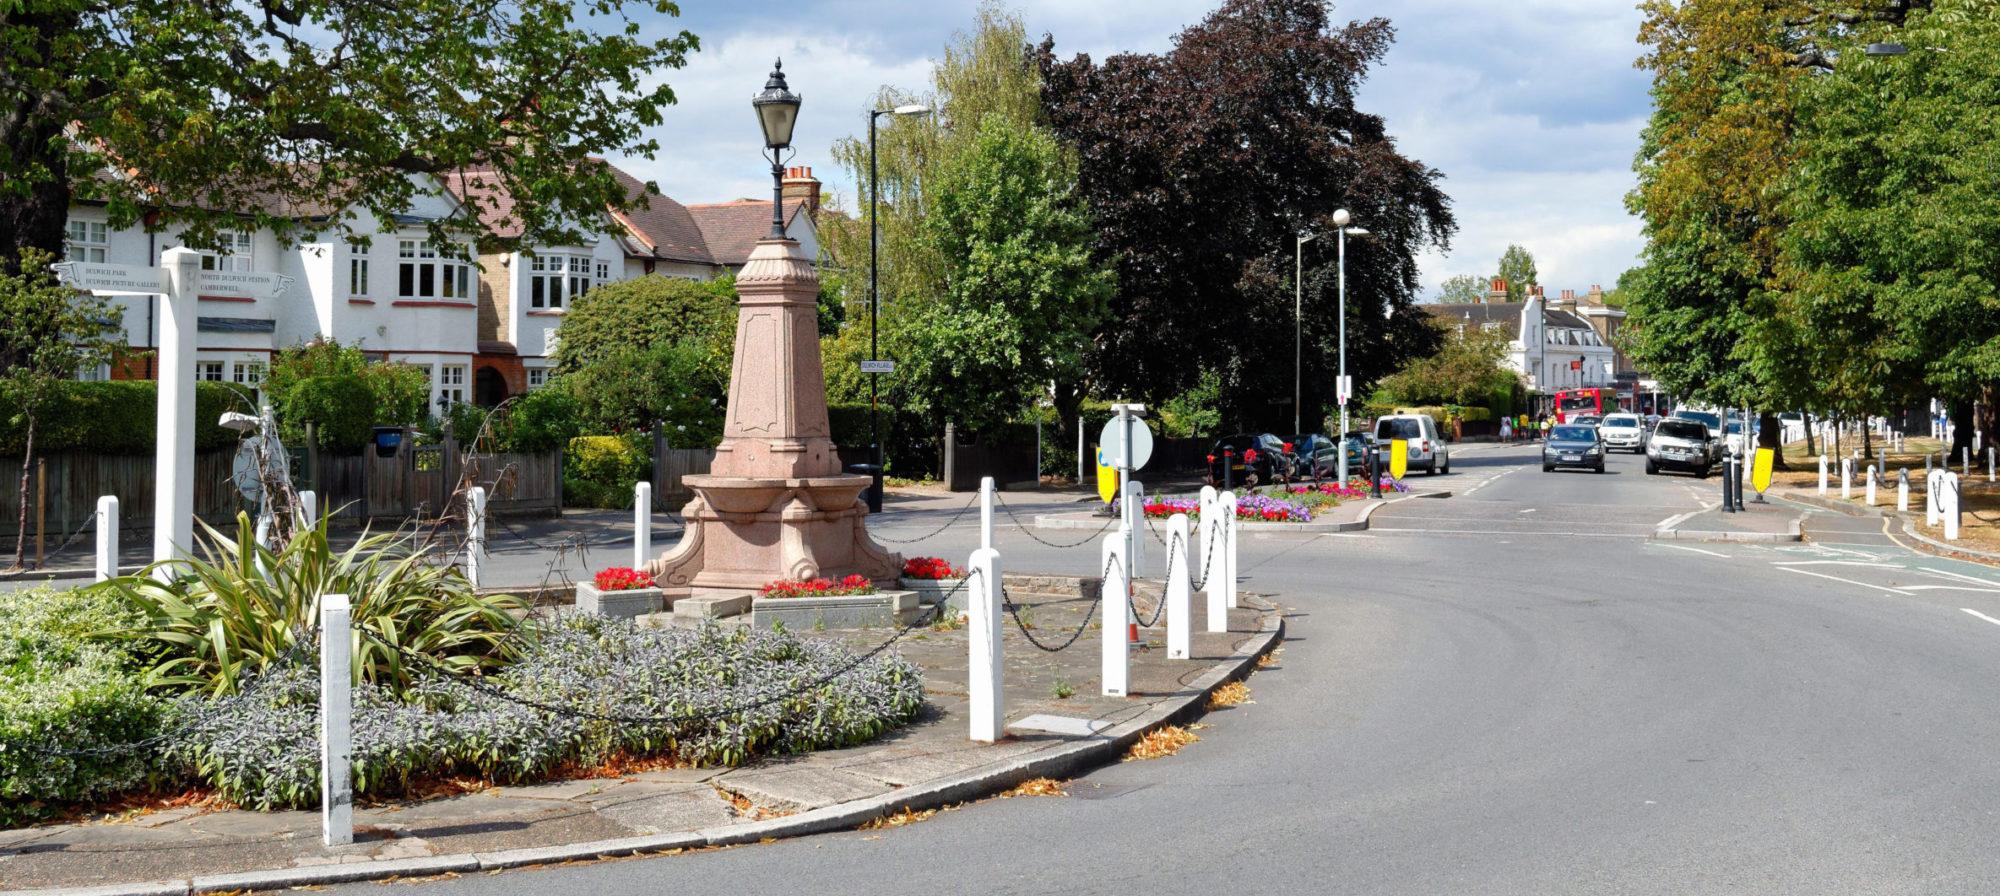 Dulwich Residents' Association